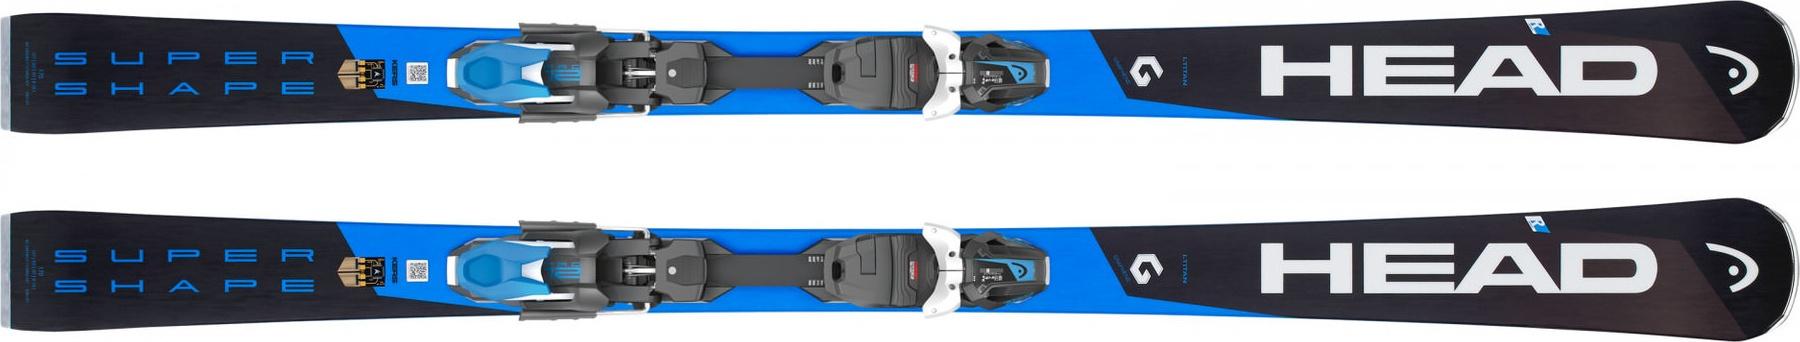 Горные лыжи Head Supershape i.Titan SW MFPR + PRD 12 2019, 177 см фото